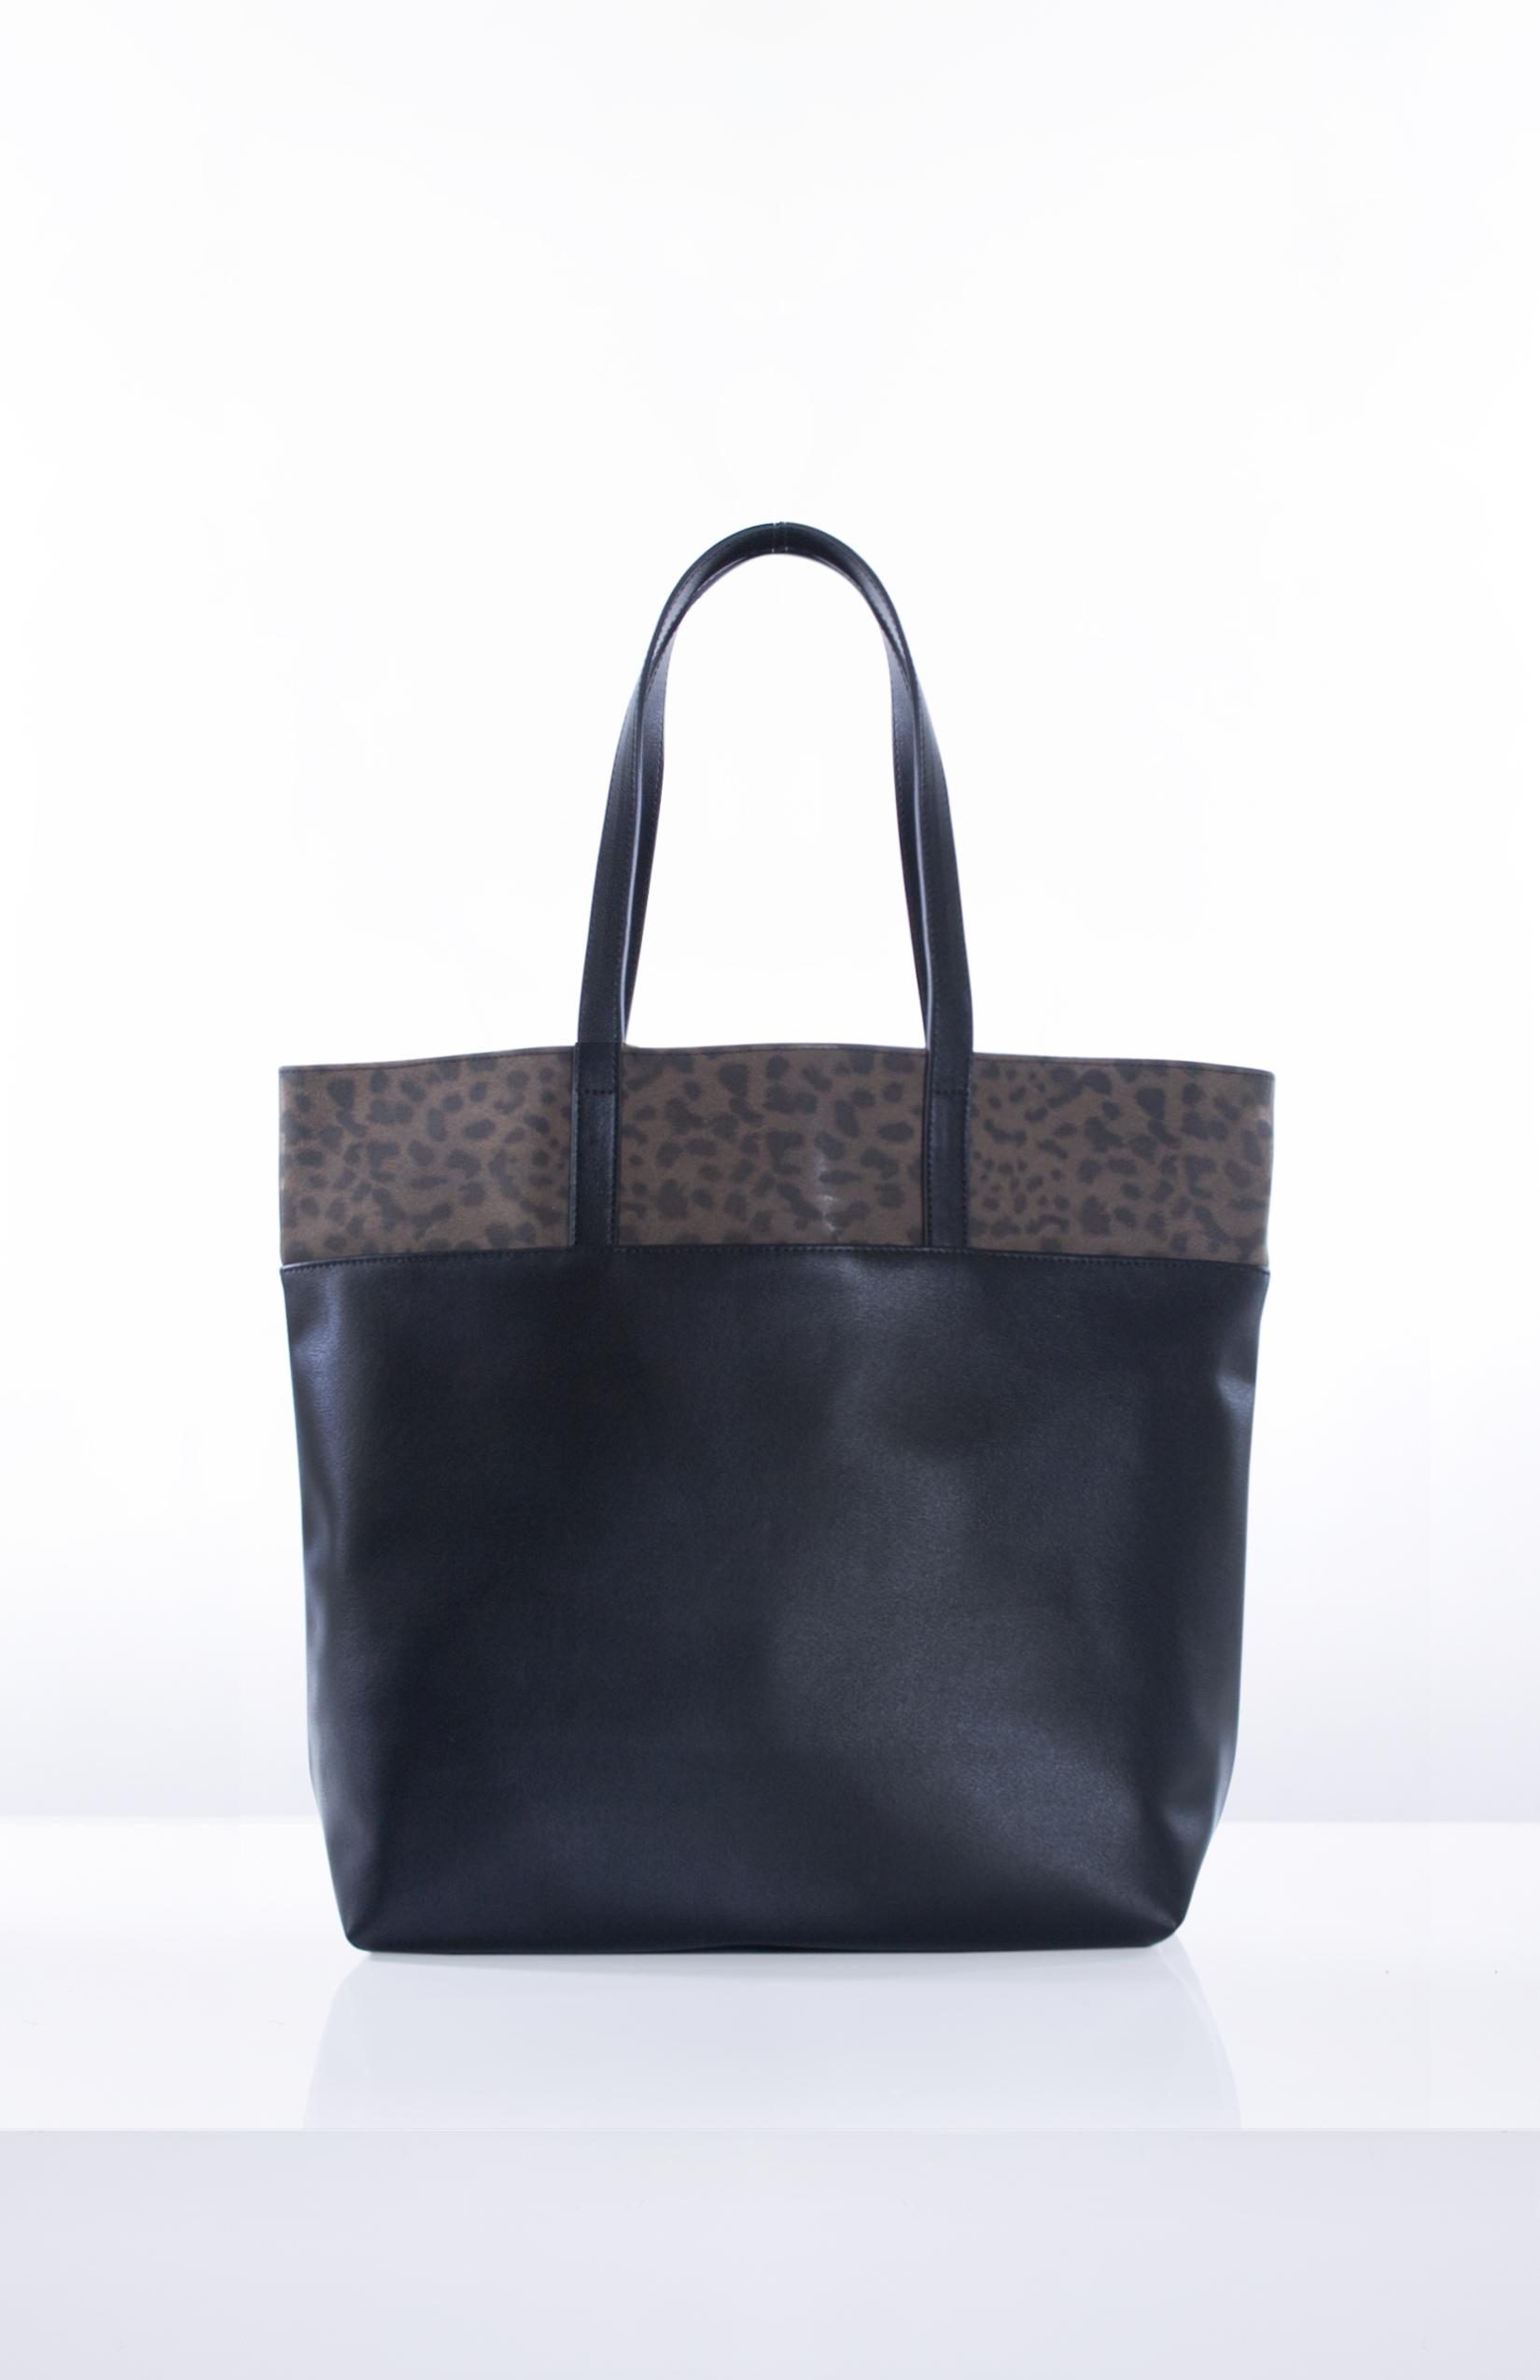 LILITH- BrownLeopard + Black PU